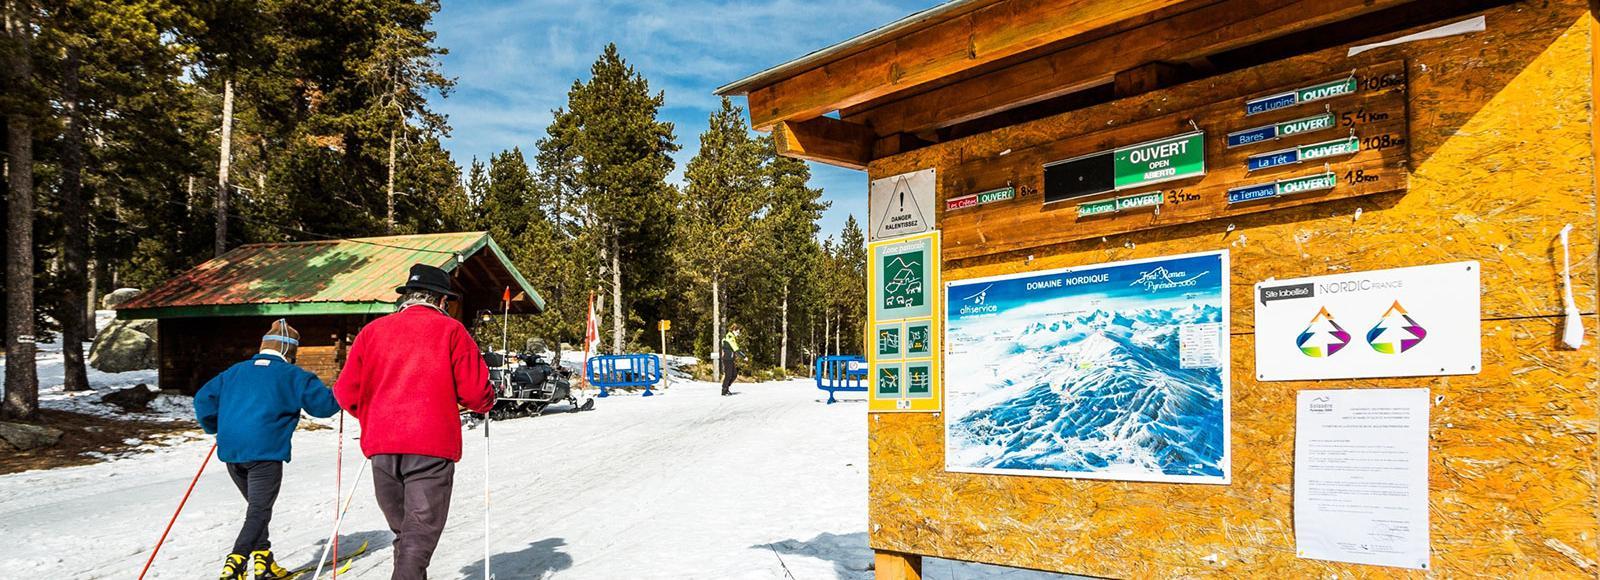 ski de fond - Espace Nordique du Capcir